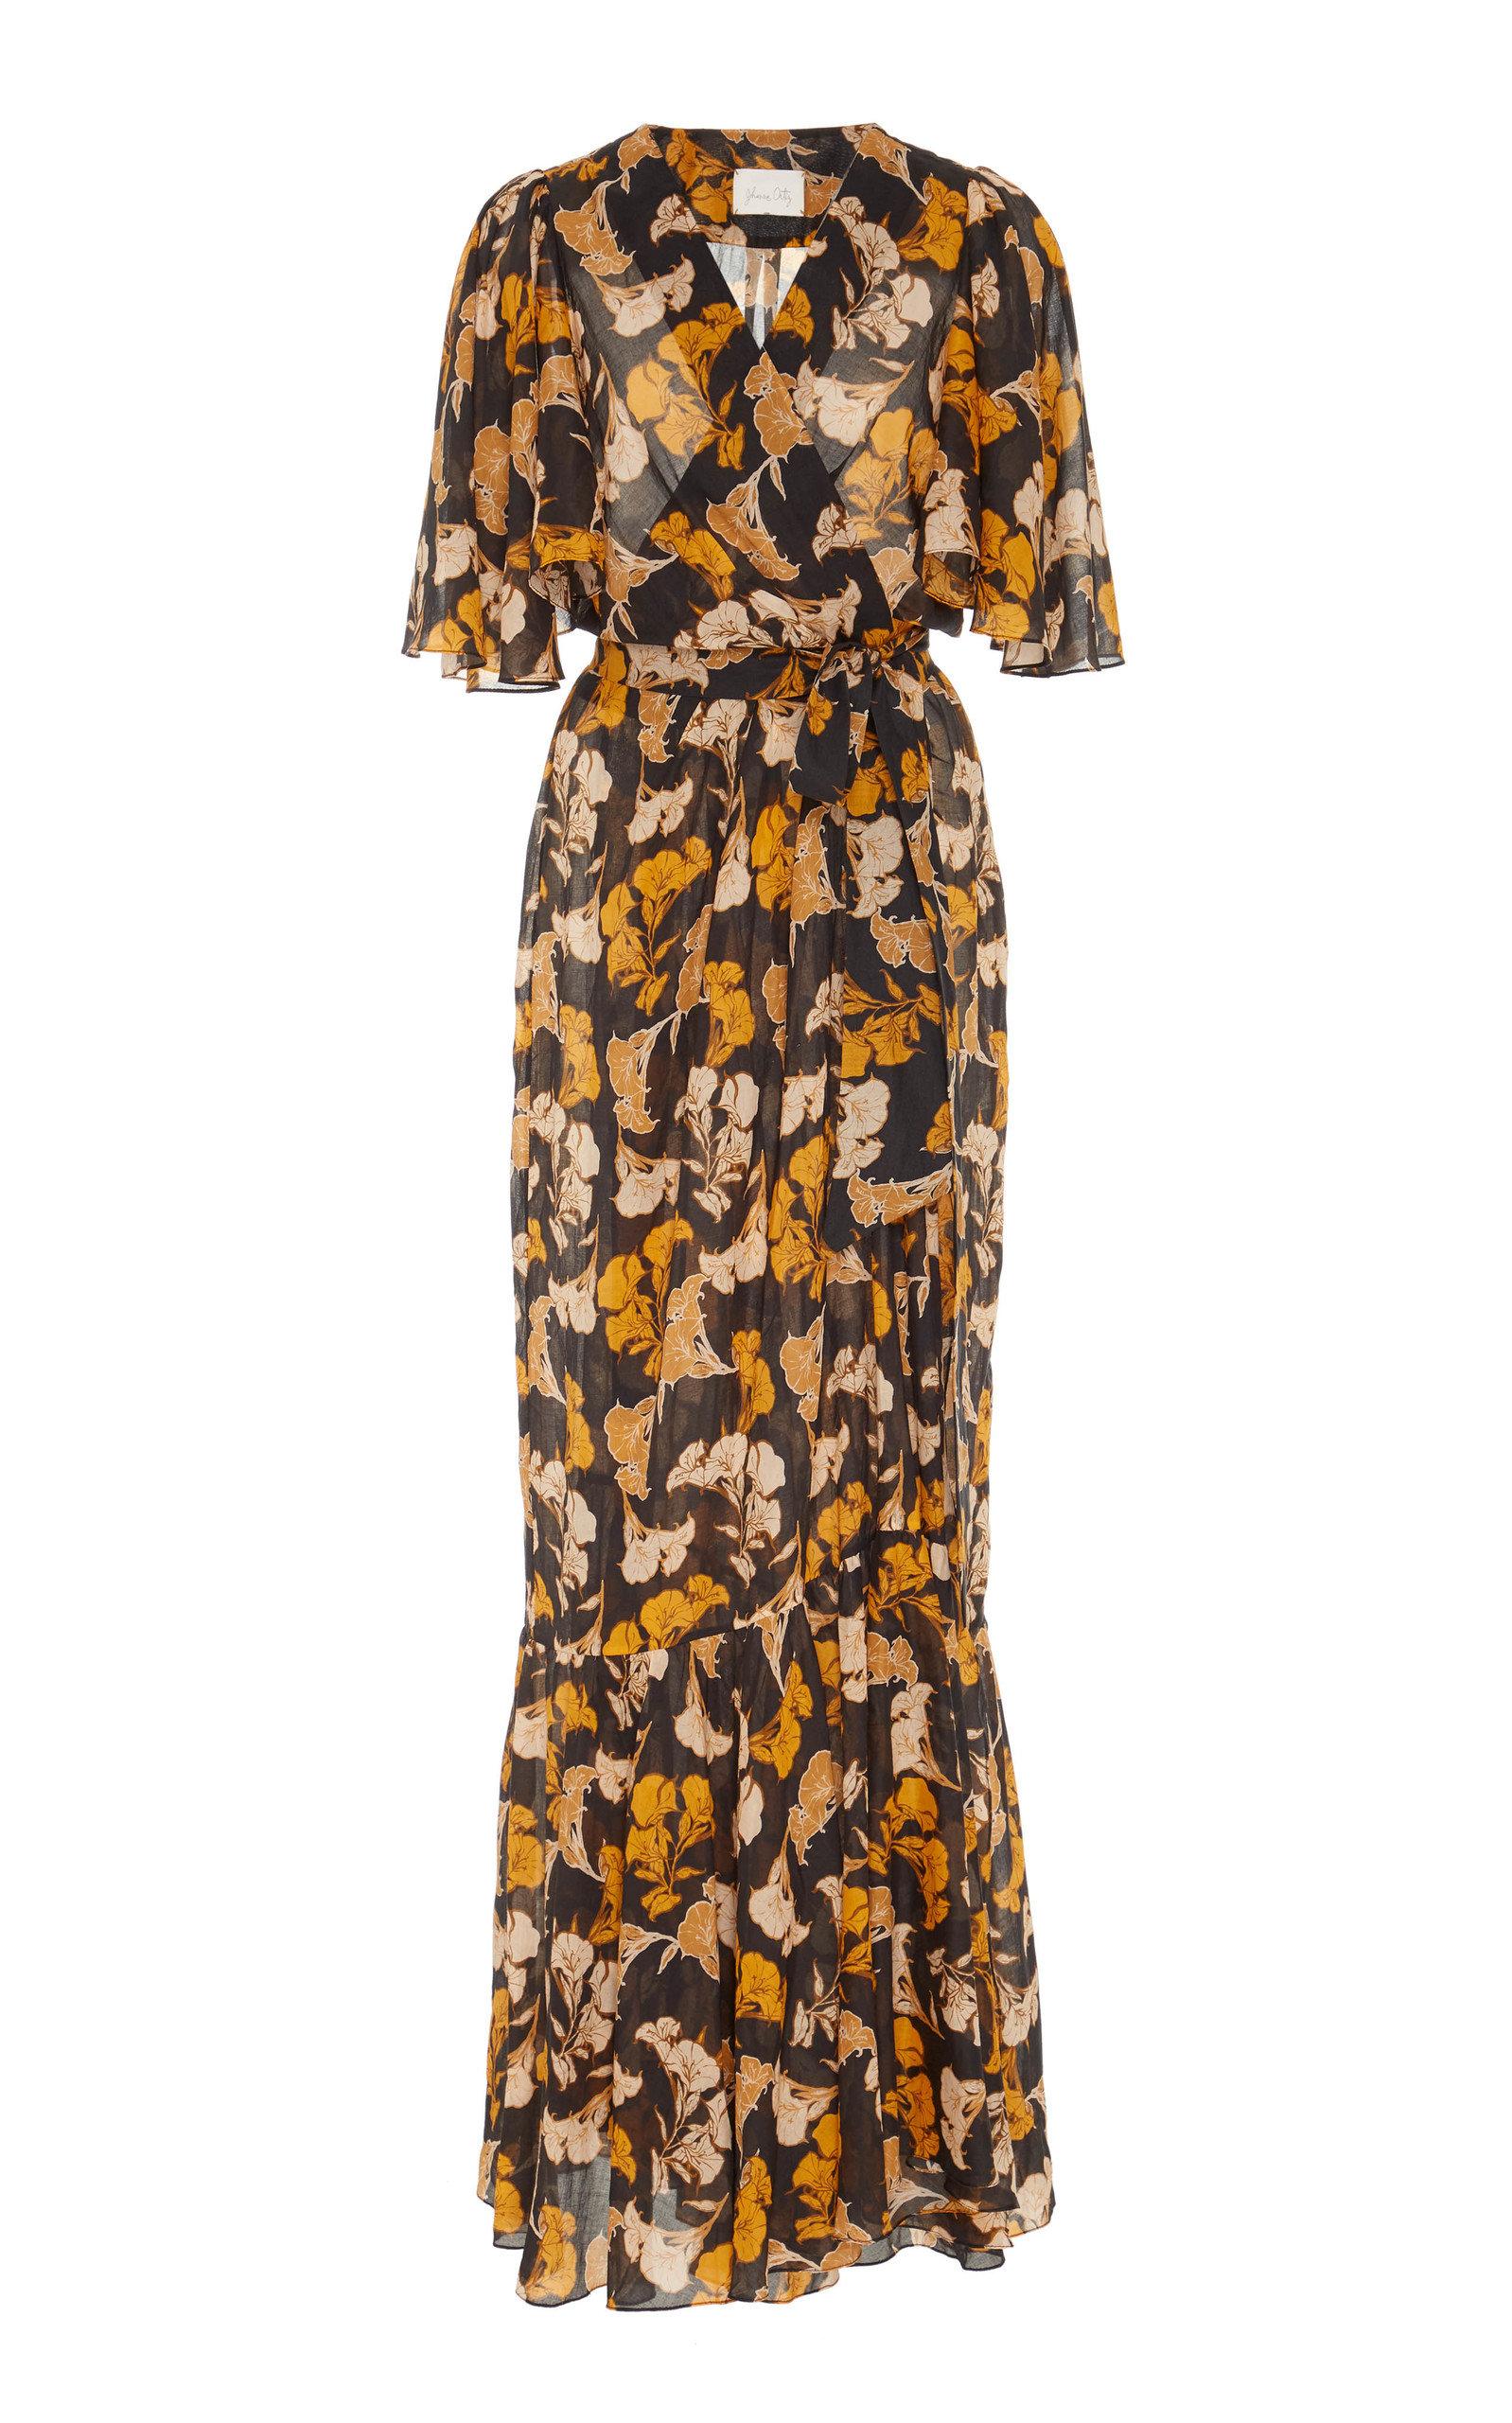 Buy Johanna Ortiz Gypset Life Floral-Print Cotton Midi Dress online, shop Johanna Ortiz at the best price